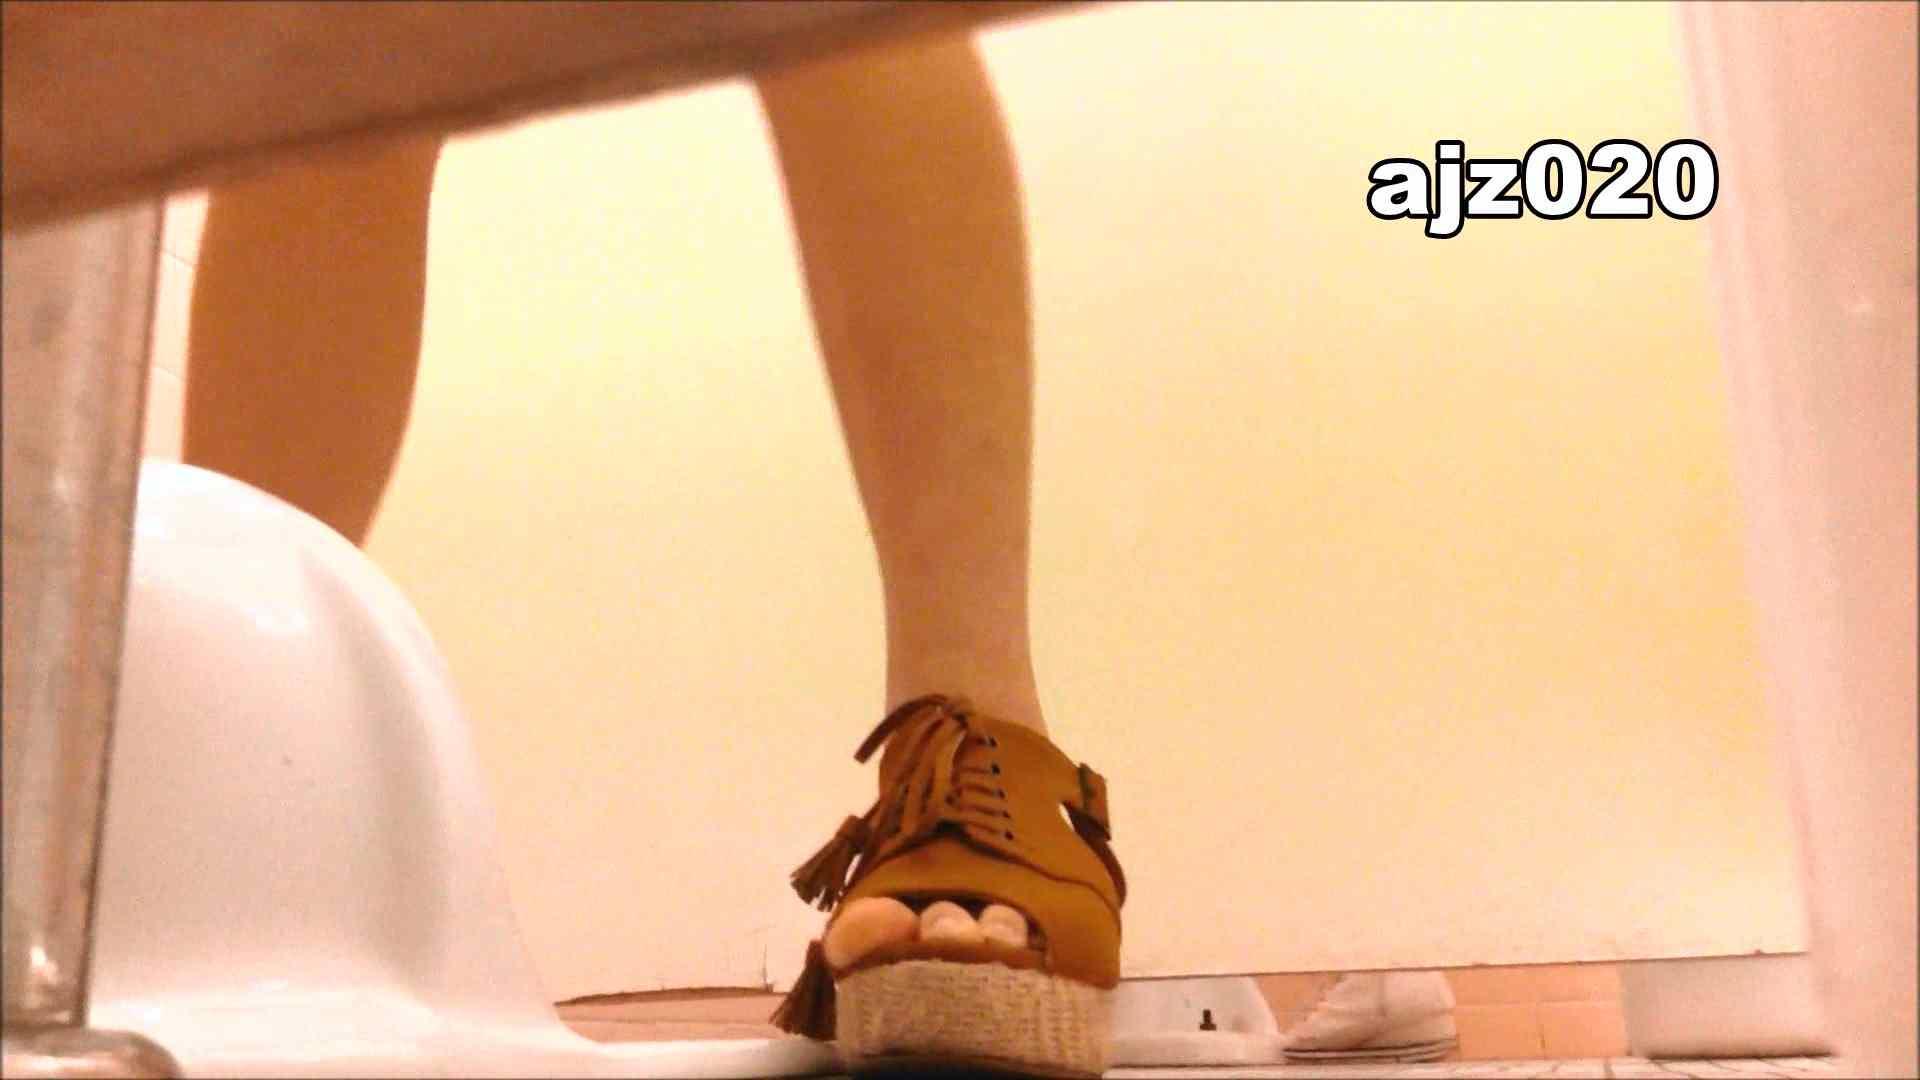 某有名大学女性洗面所 vol.20 排泄 AV動画キャプチャ 101枚 31